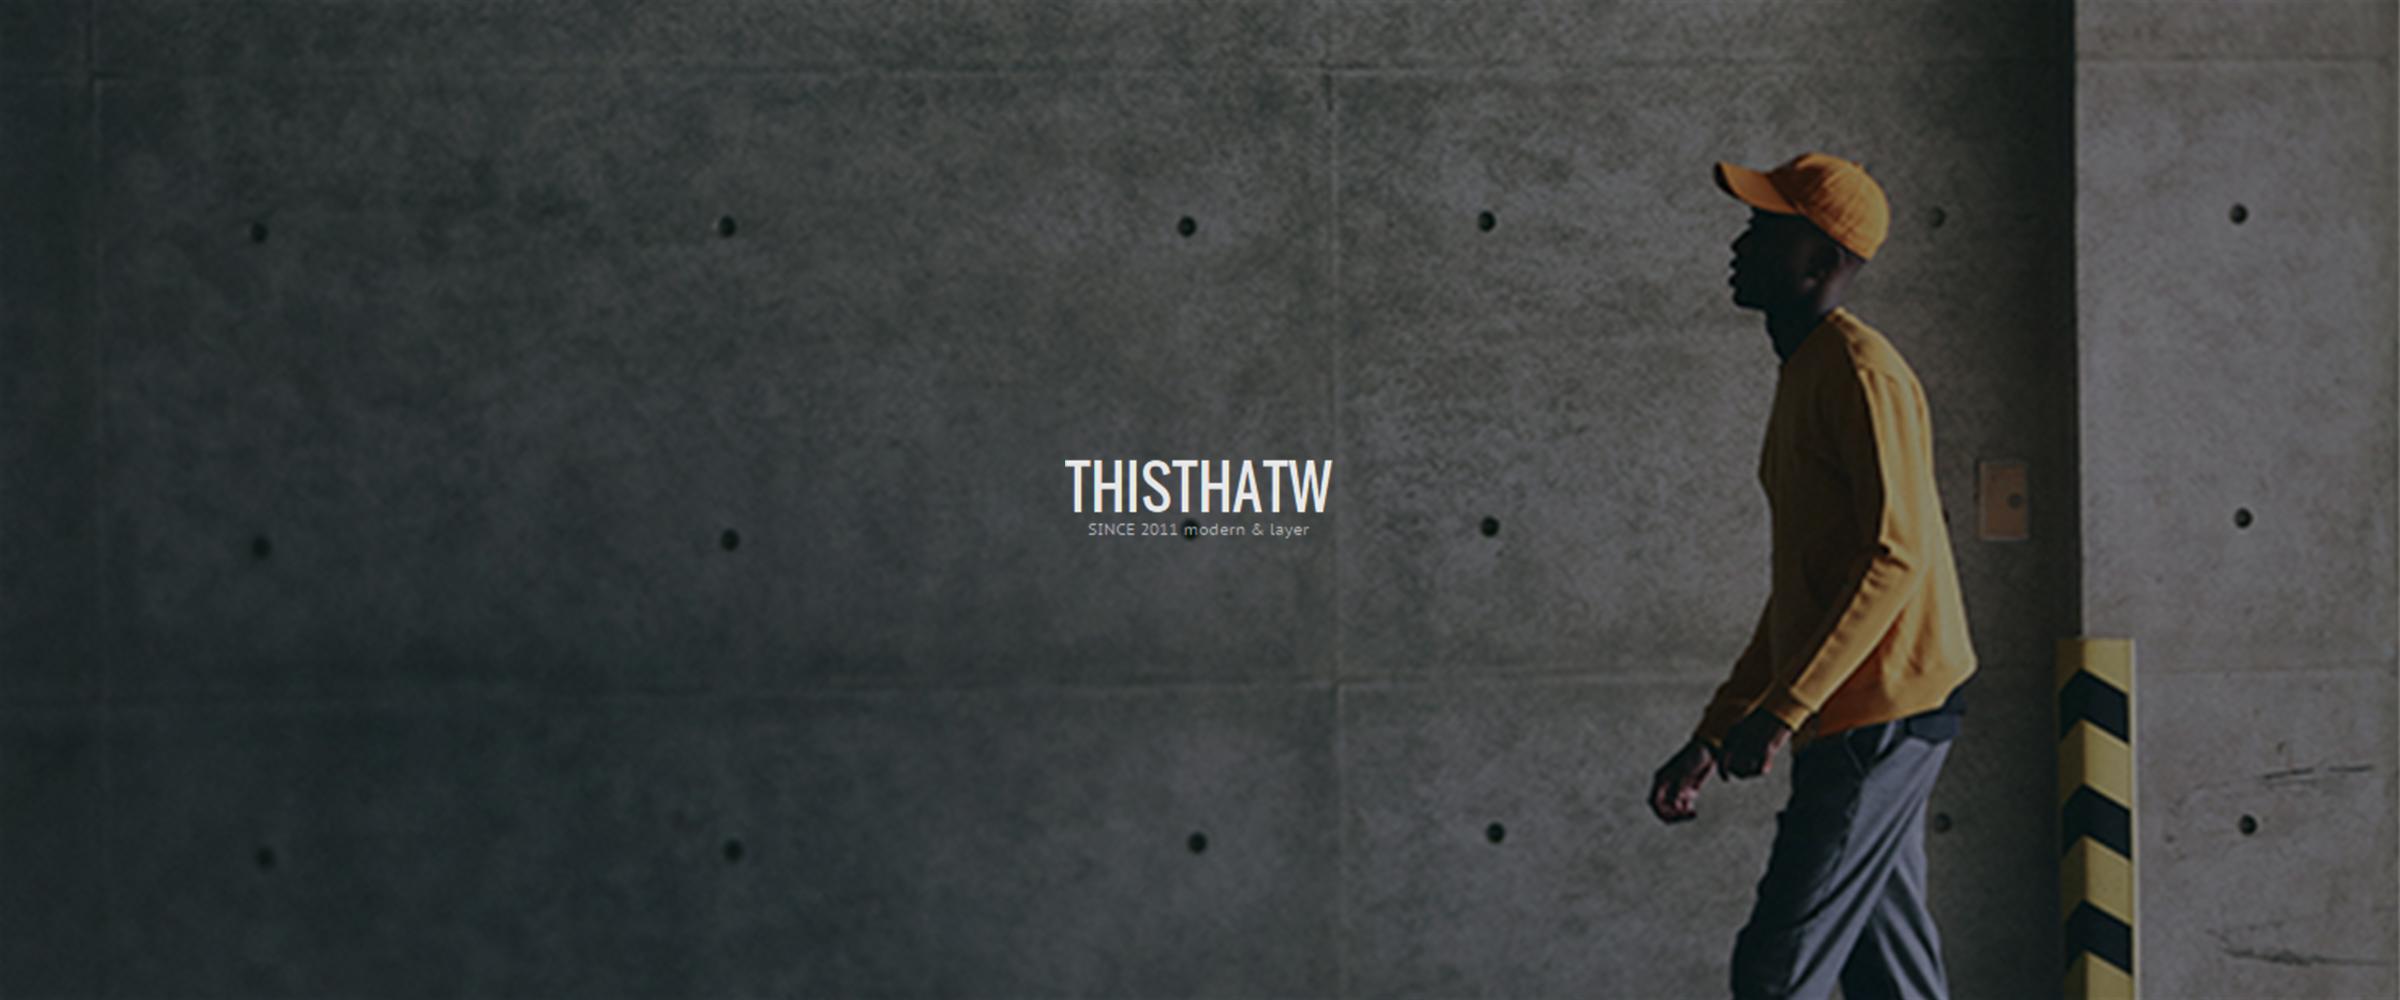 thisisthatw.jpg